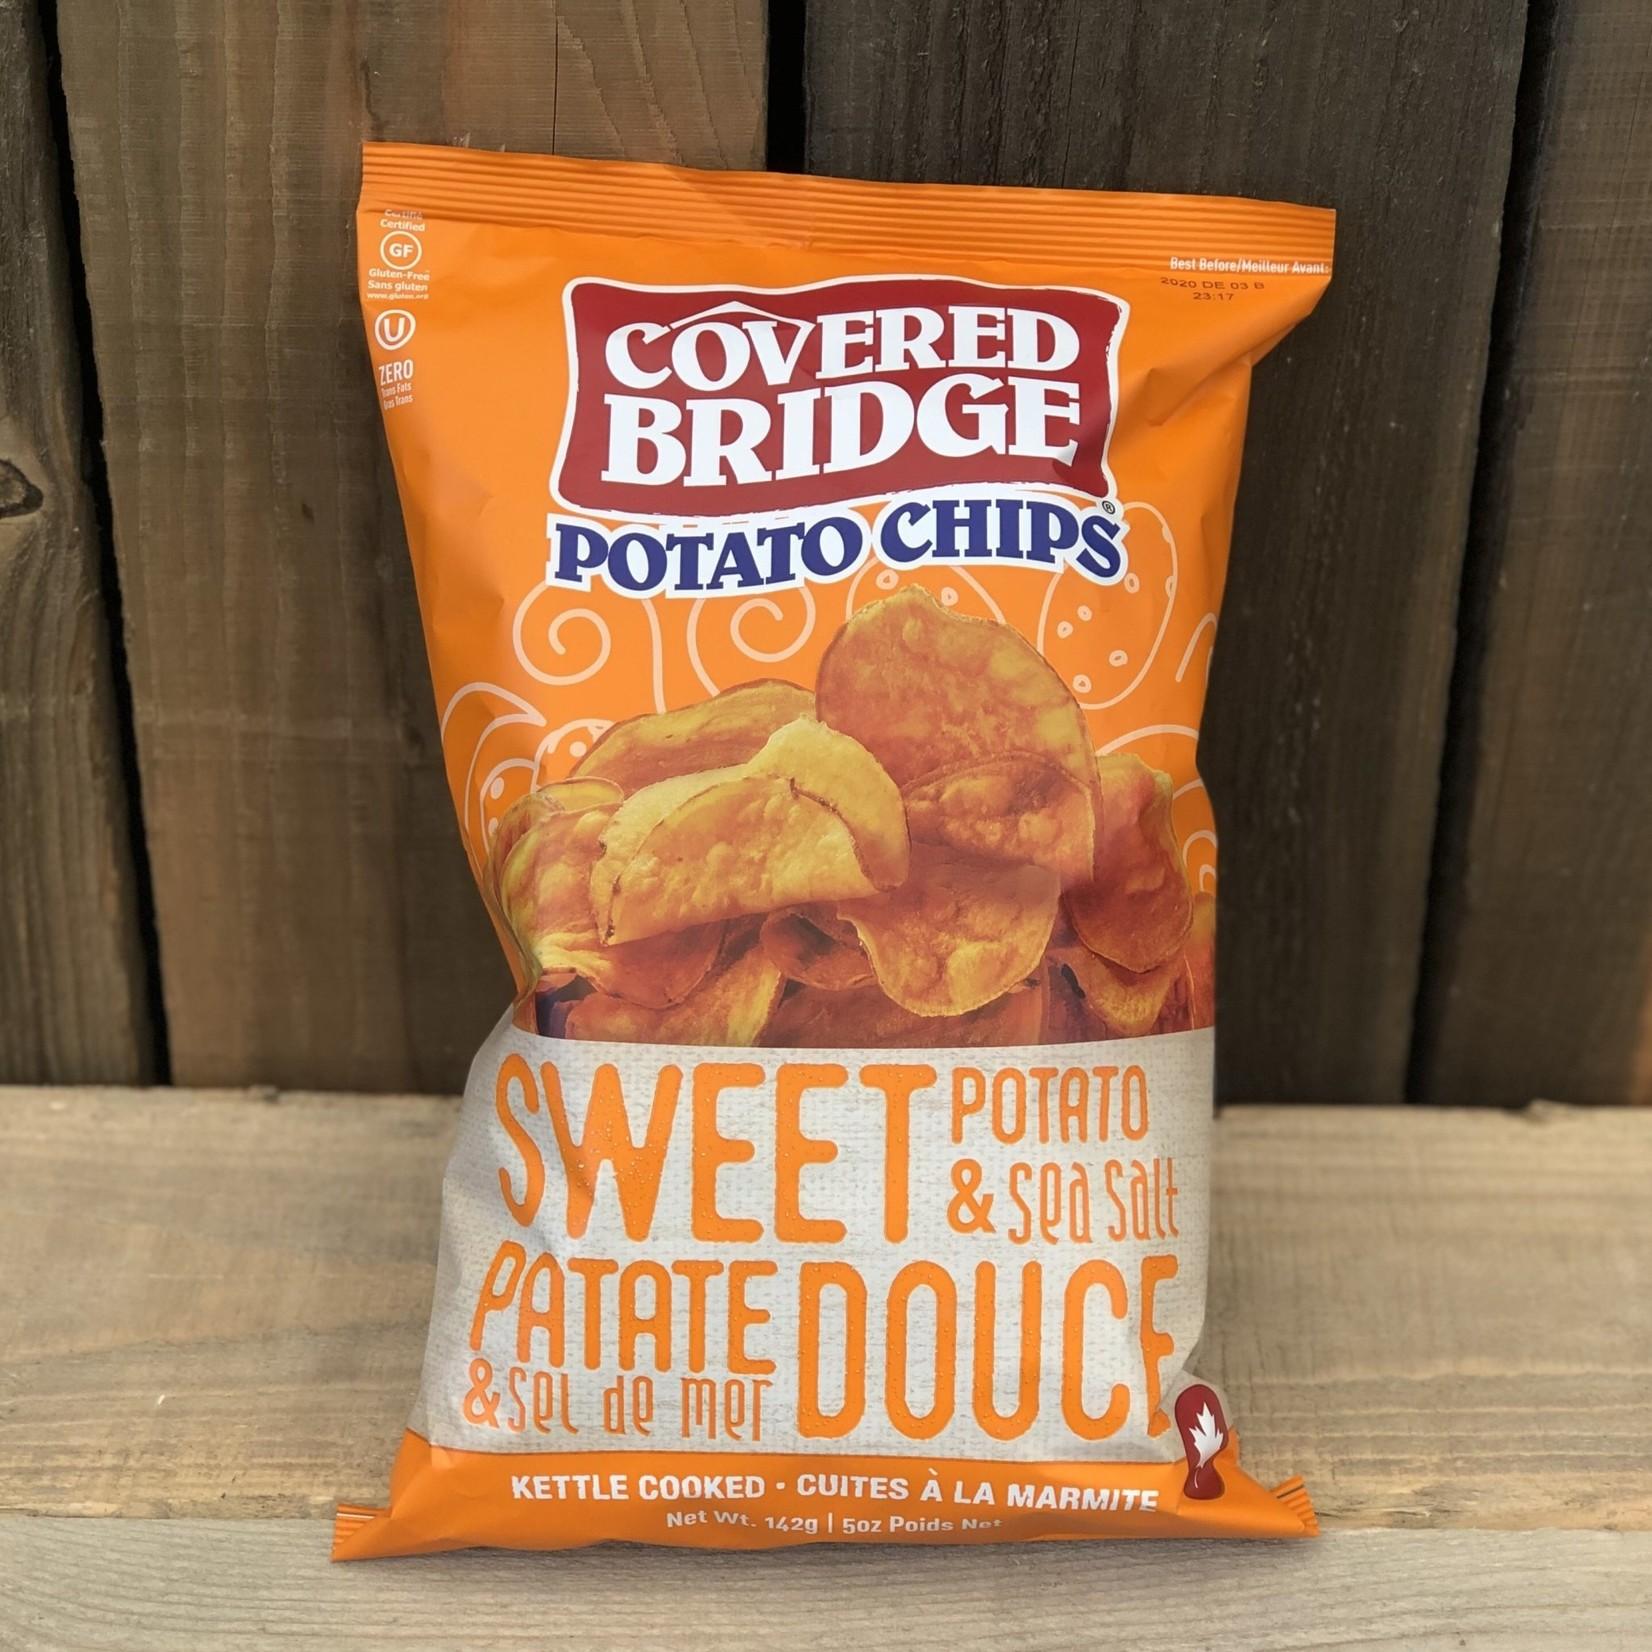 Chips Patate douce et sel de mer